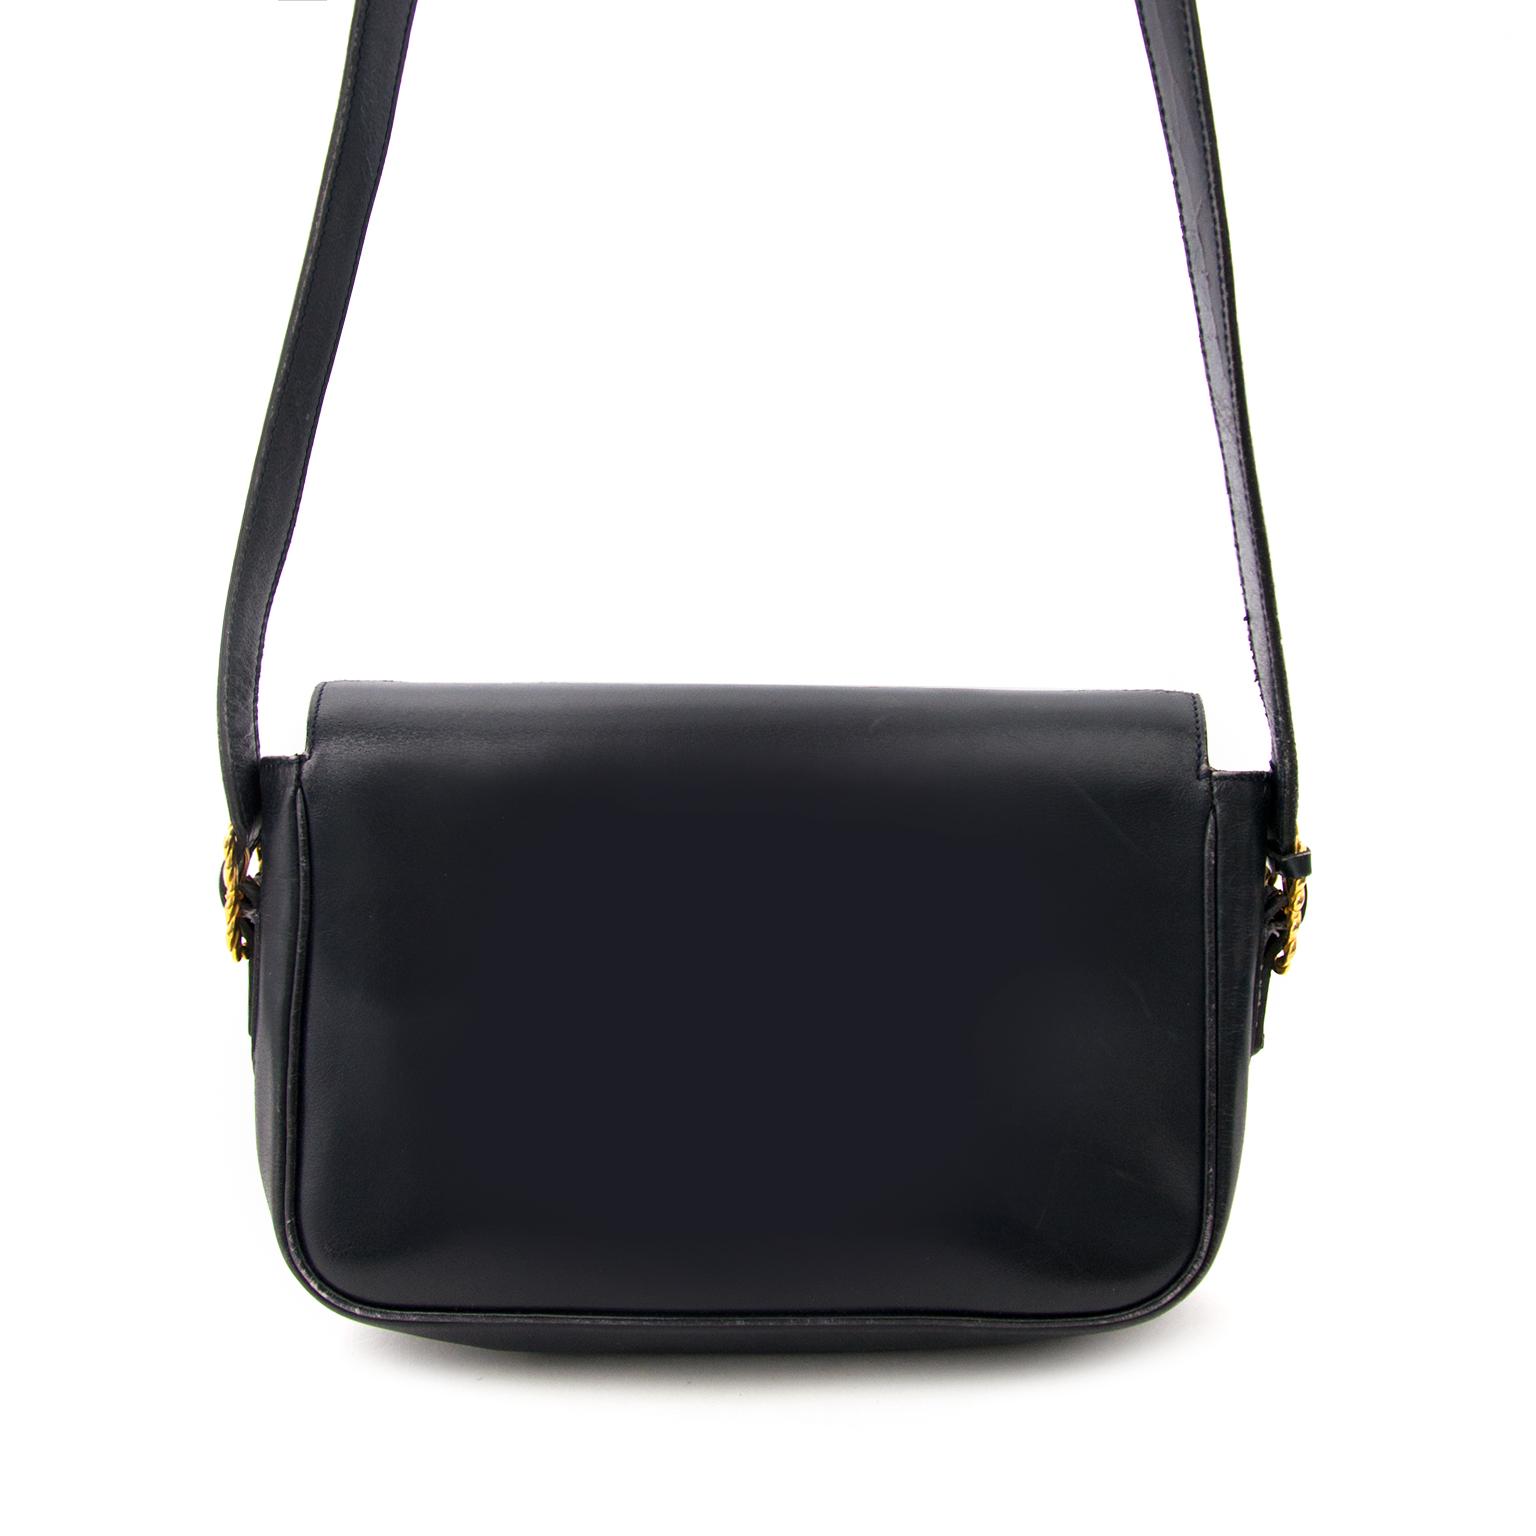 0c199e3063 ... Shop authentic designer bags like Celine safe and secure online  shopping at Labellov.com